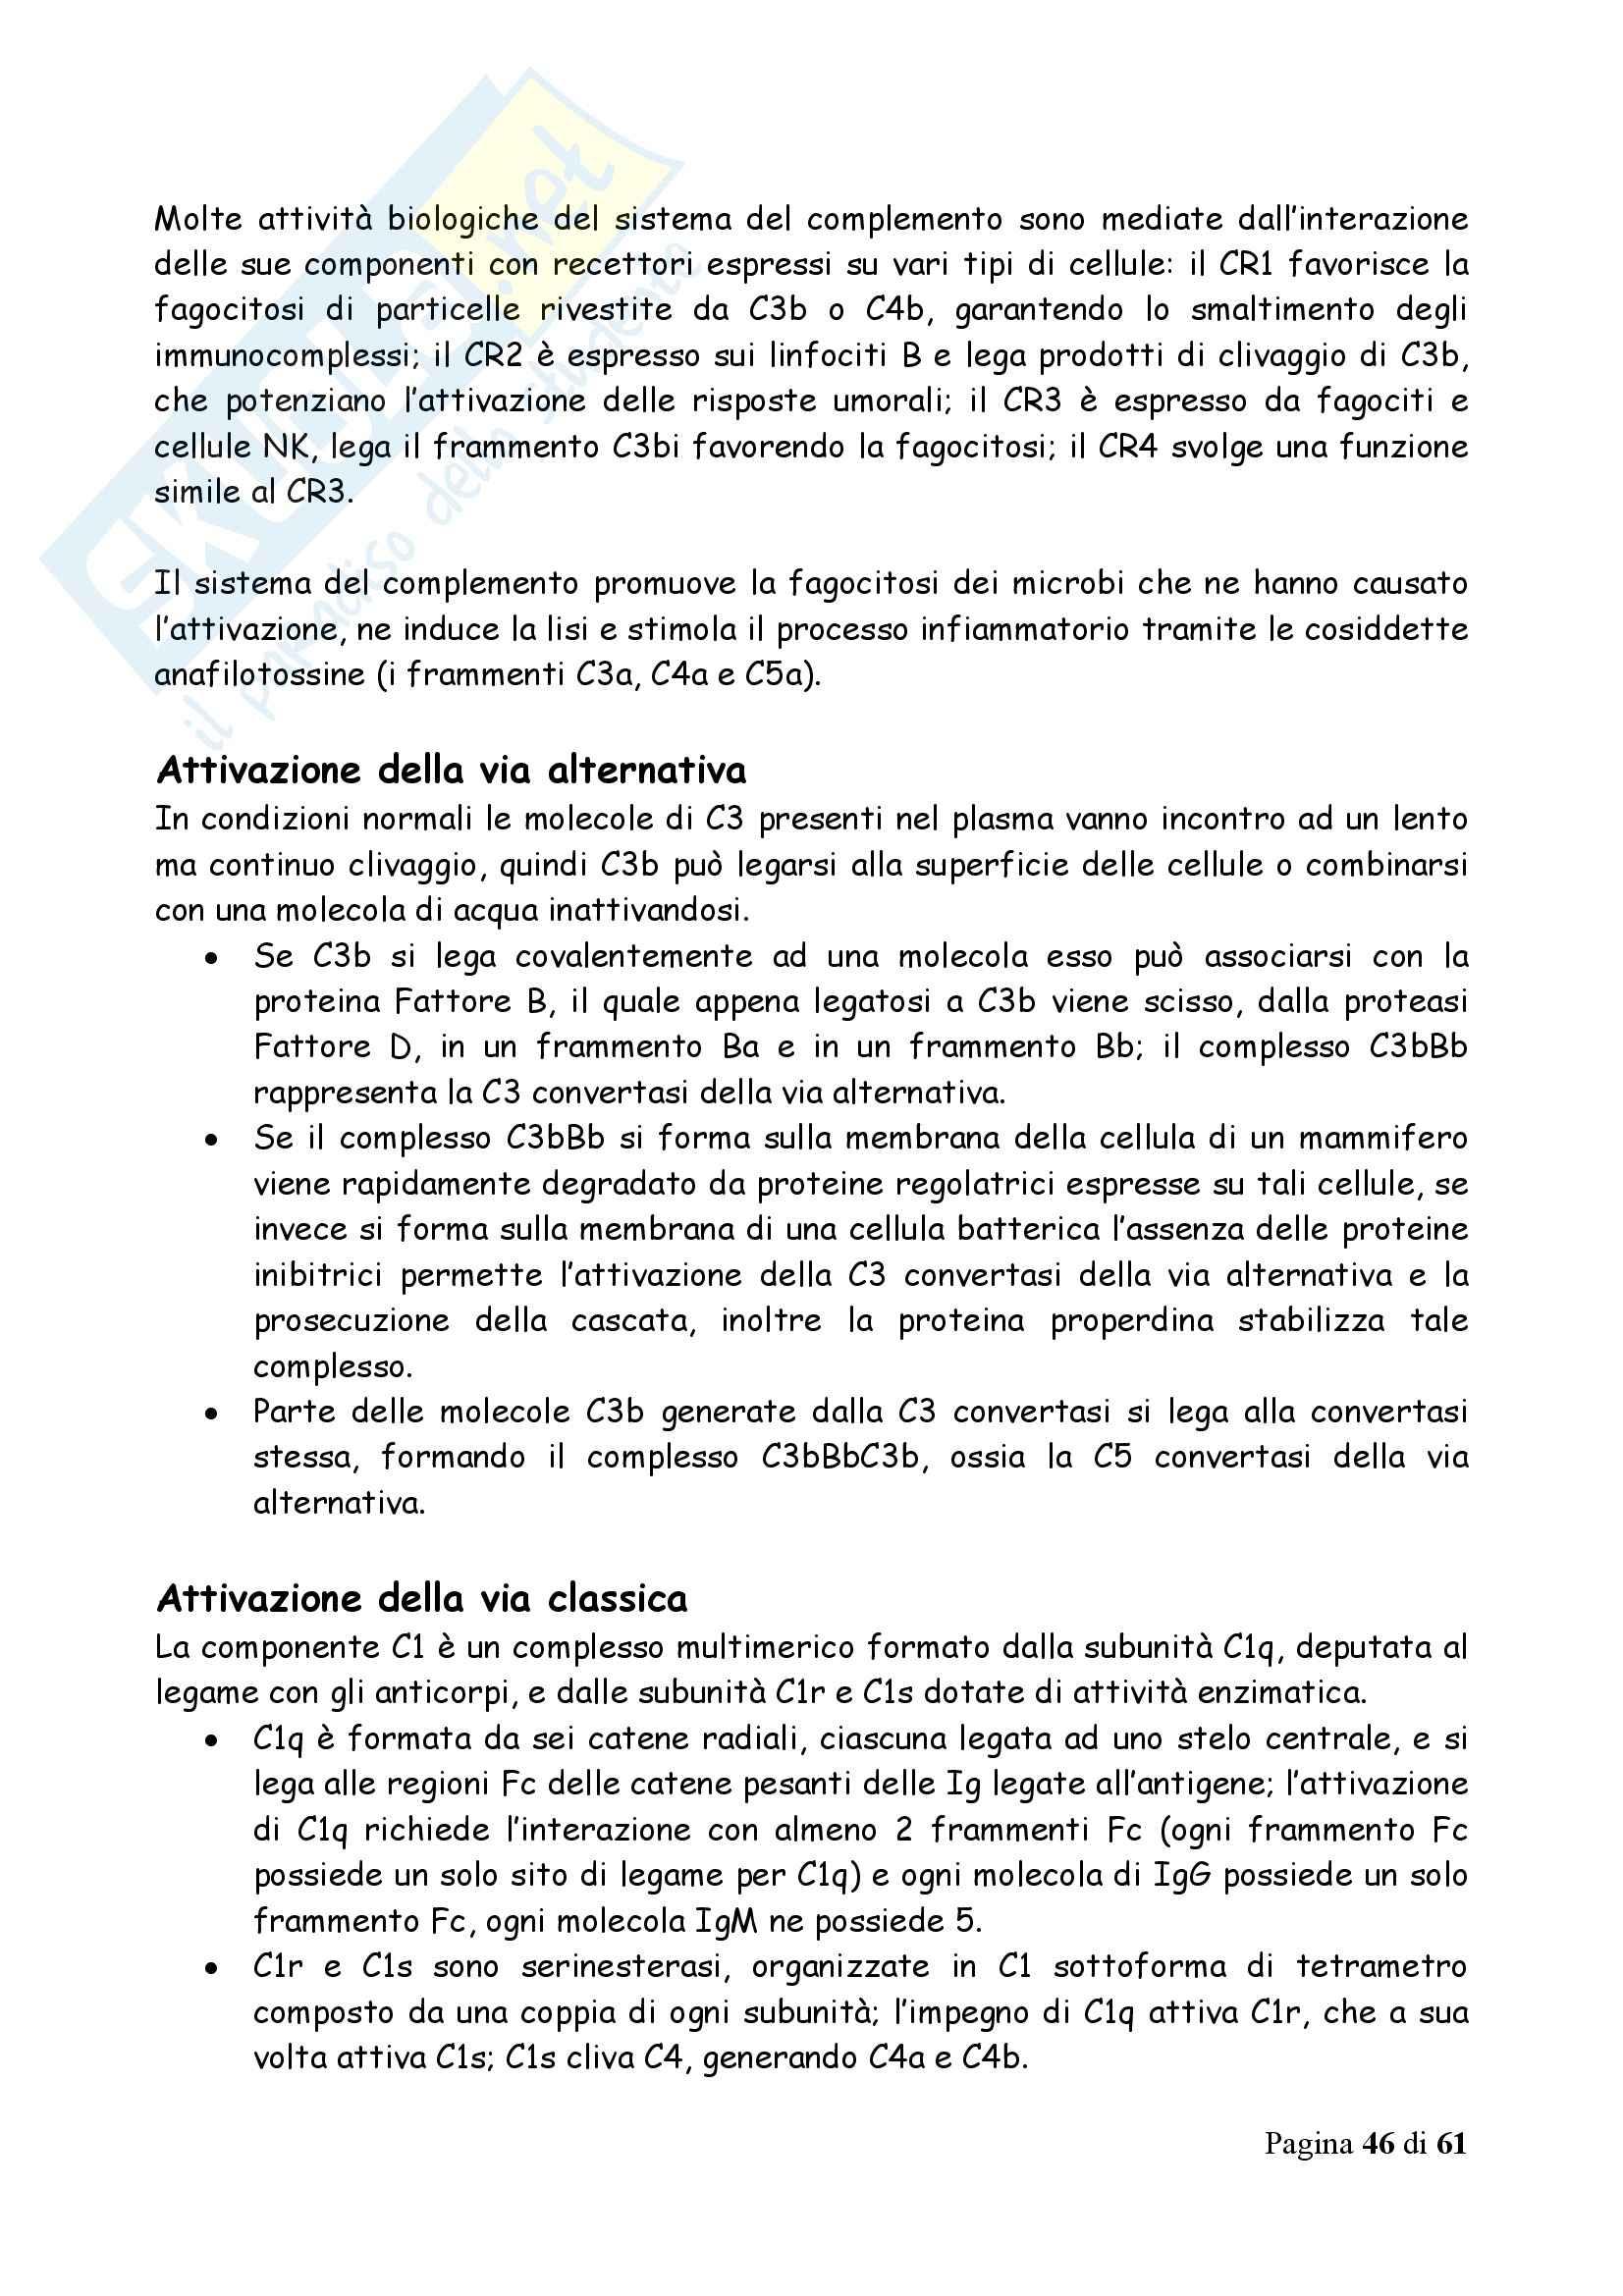 Immunologia - Appunti Pag. 46